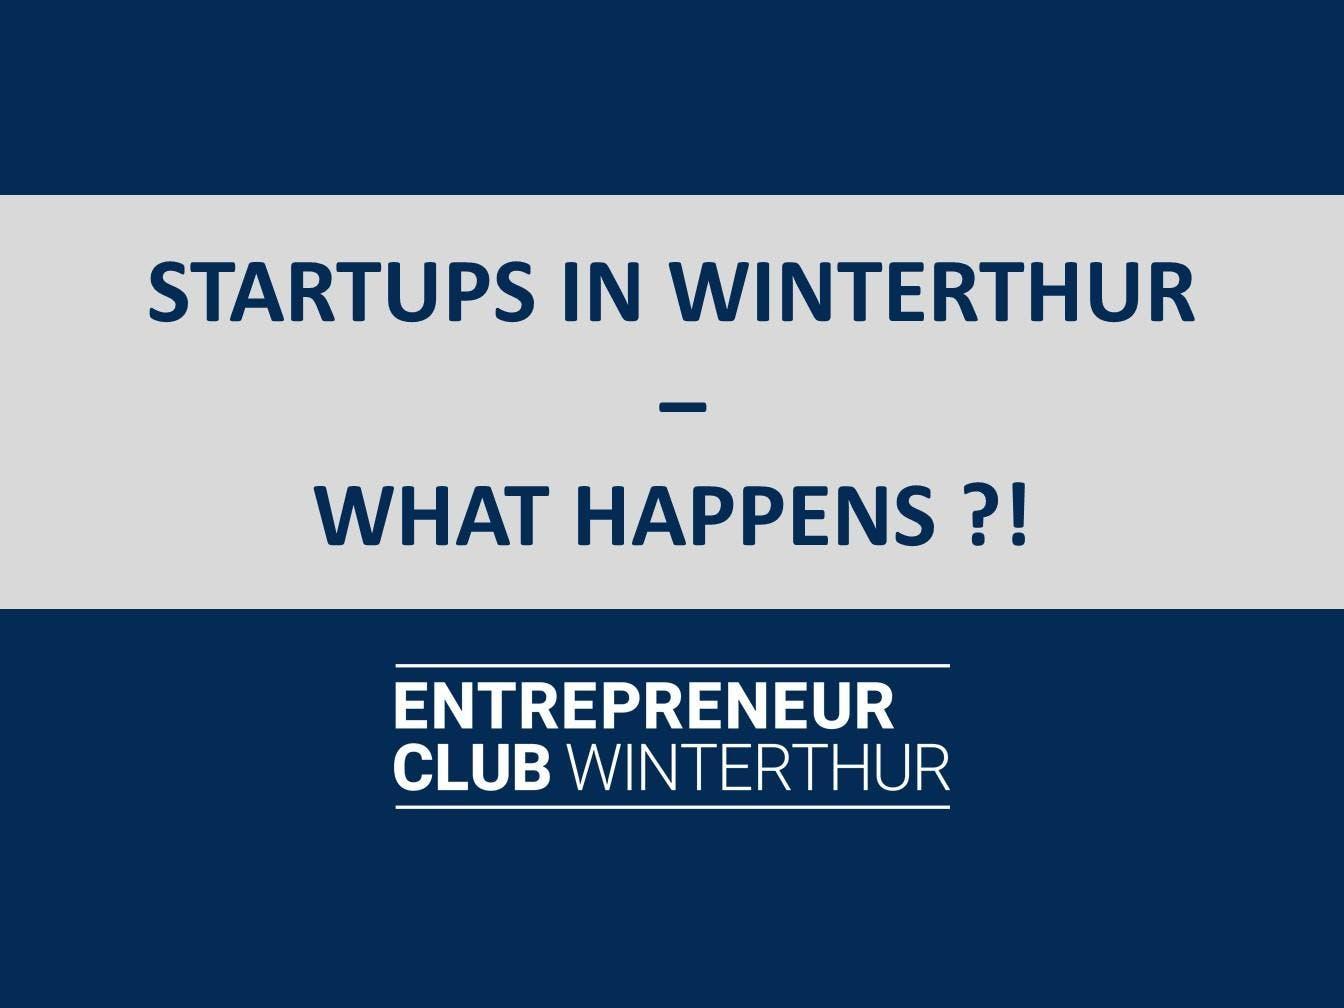 Startups in Winterthur - What happens ?!